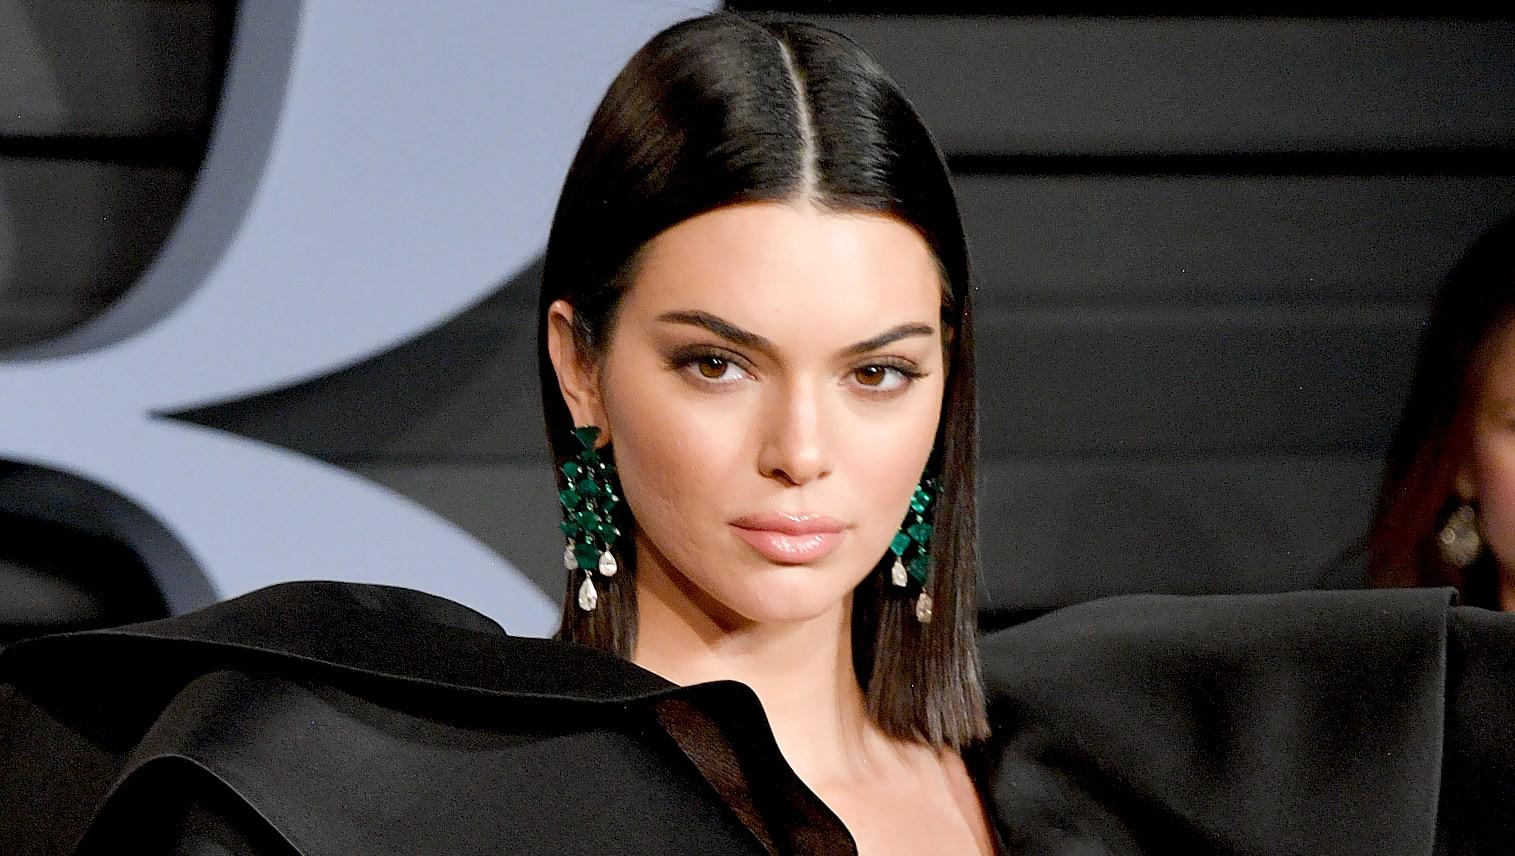 Kendall-Jenner-Hospitalized-Before-Oscars